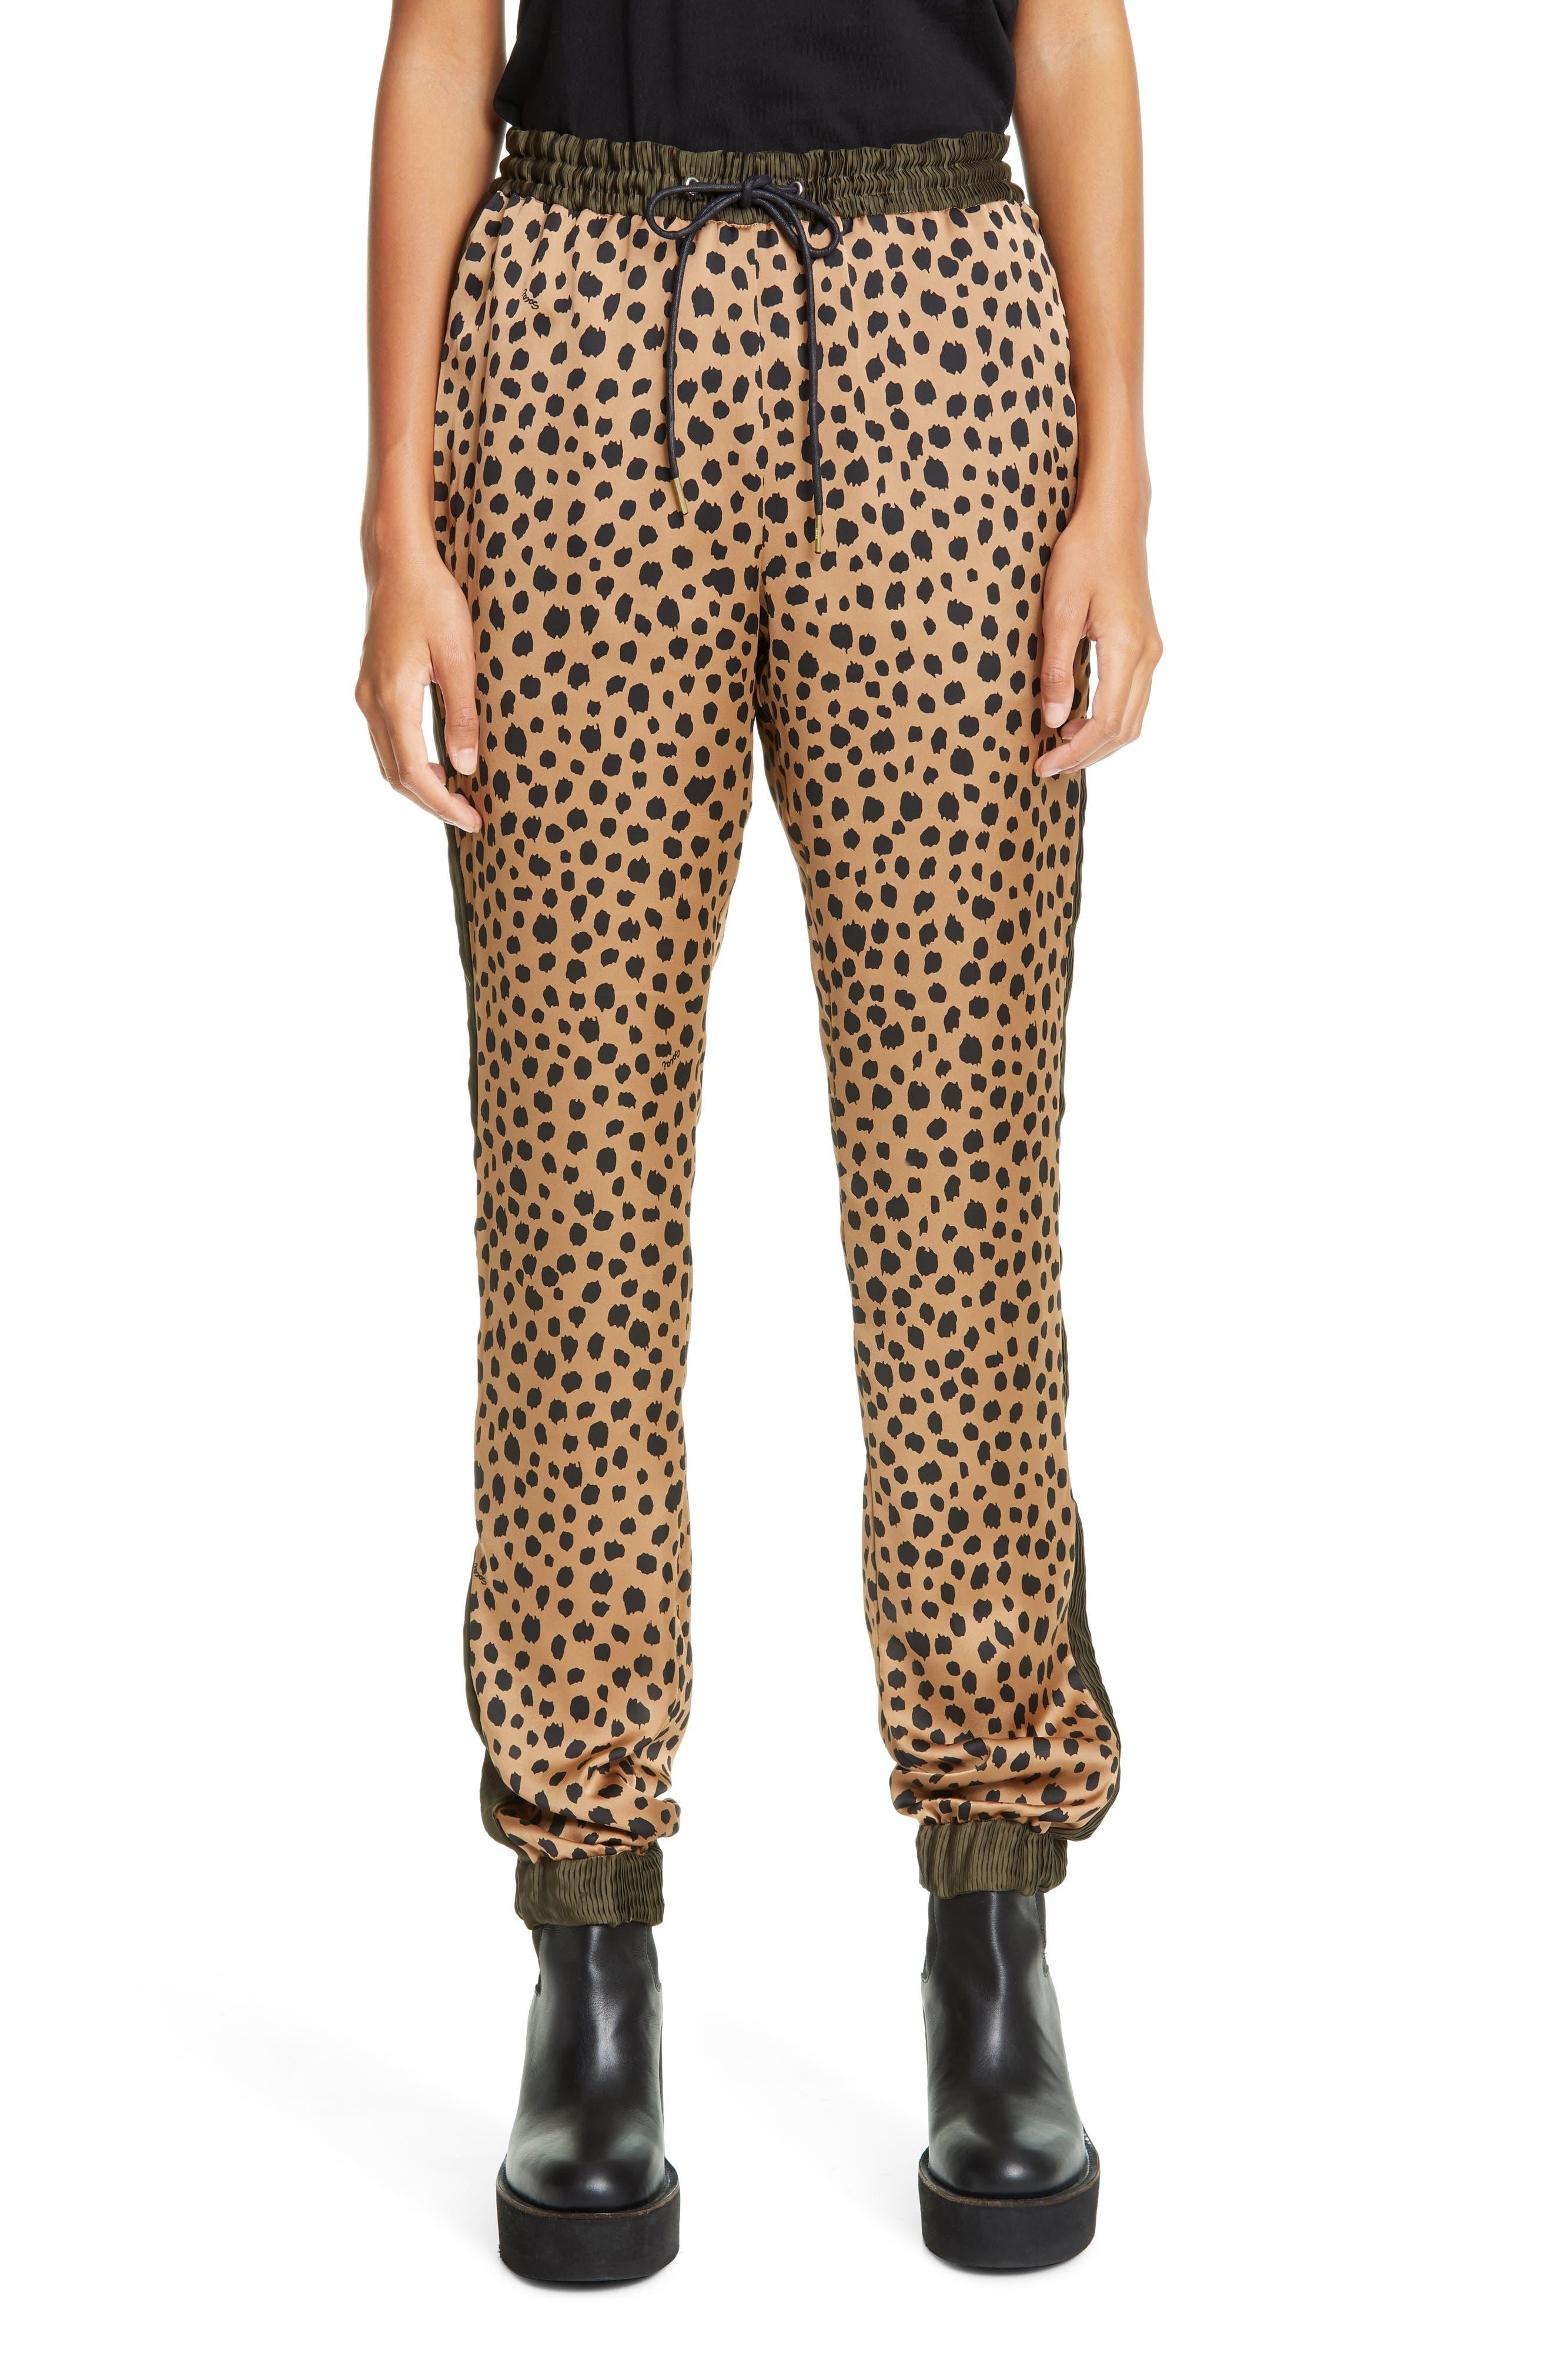 Sacai Side Pleat Cheetah Print Joggers | Nordstrom